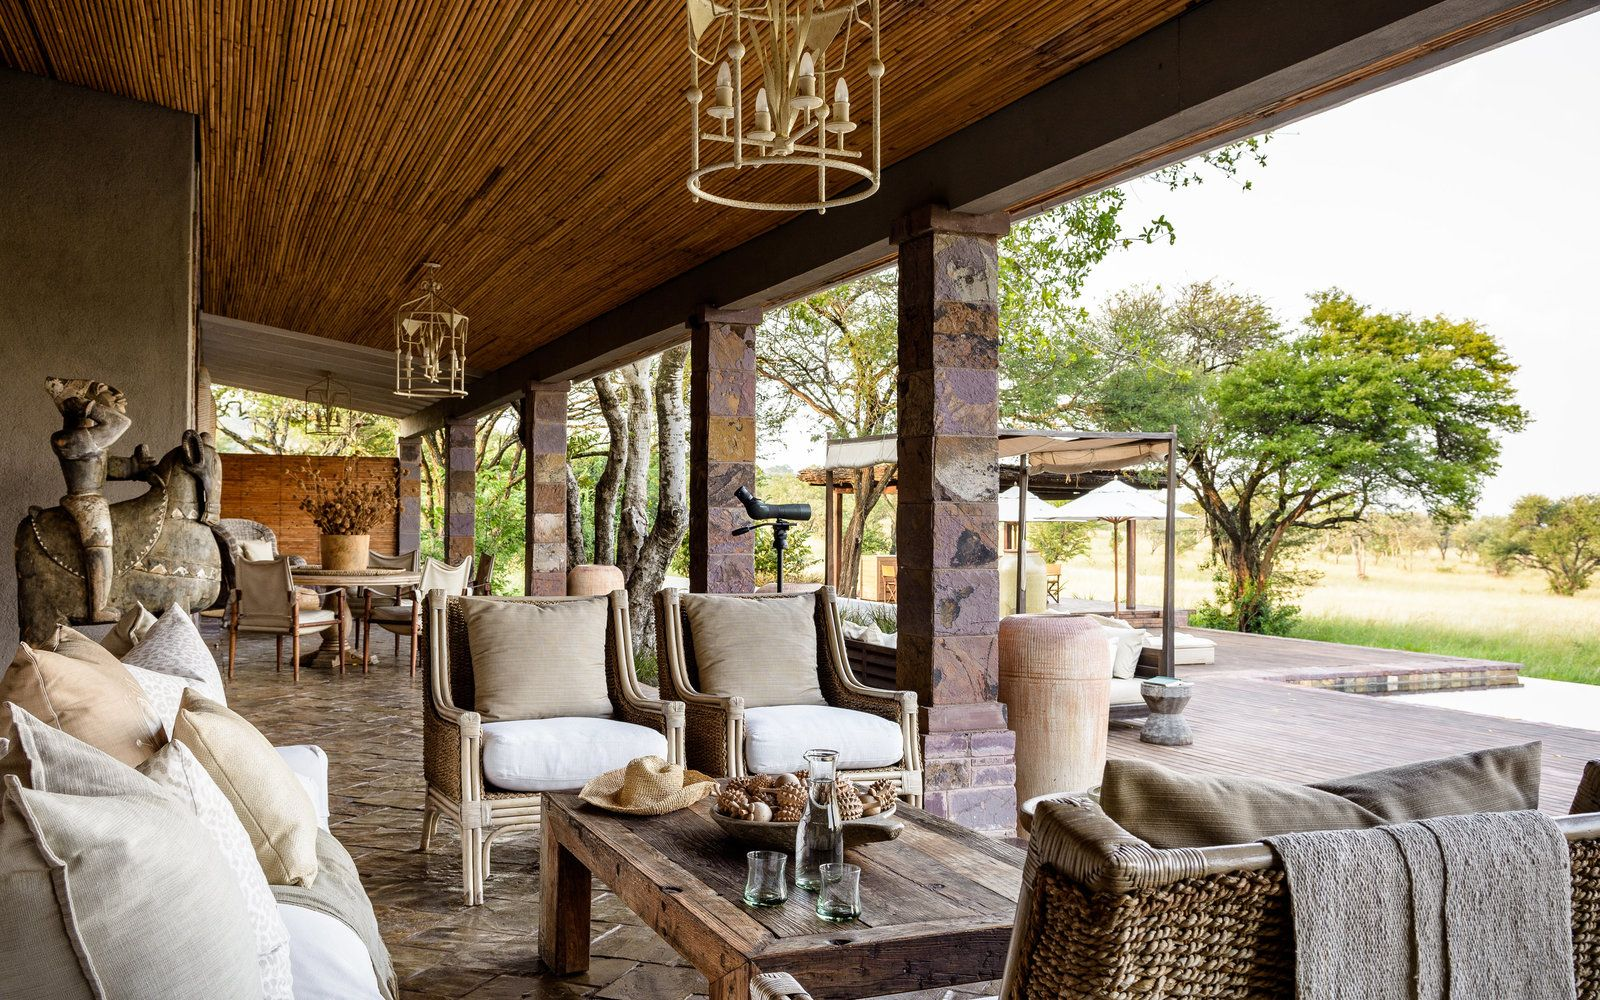 Best 100 Hotels World's Best Hotels 2019 Beautiful